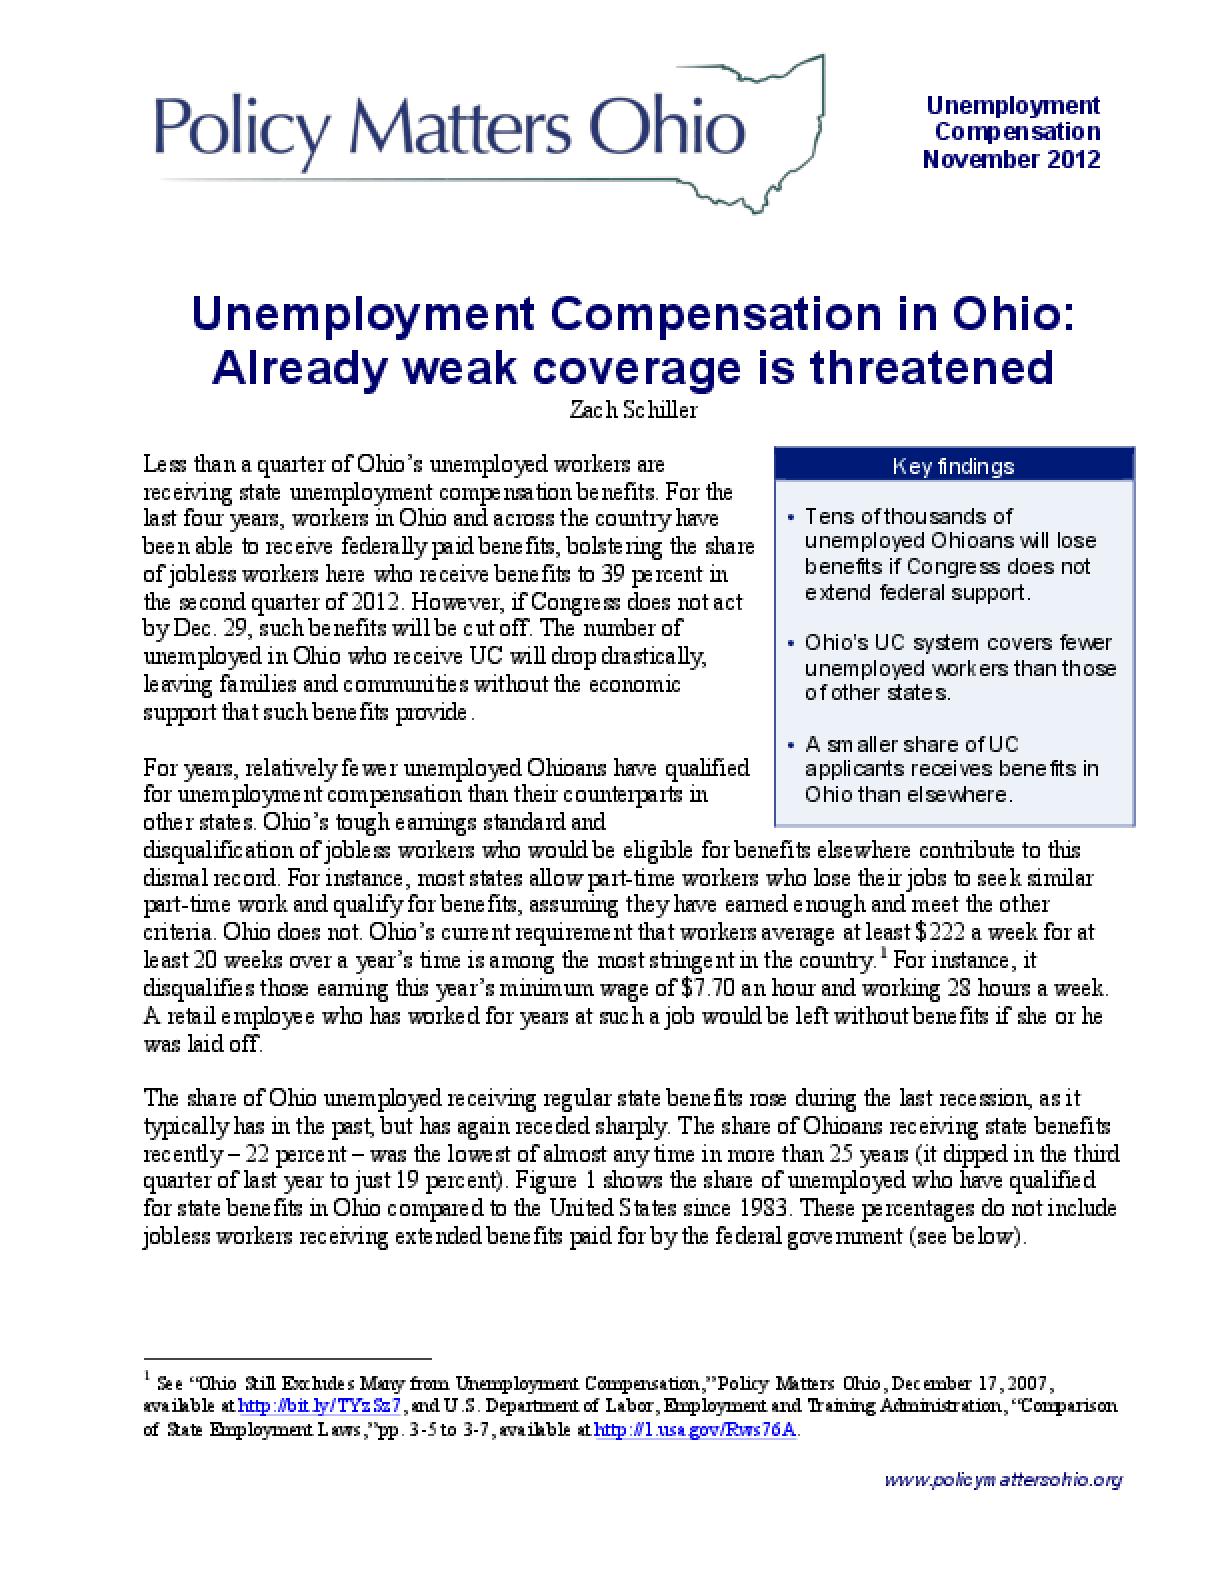 Unemployment Compensation in Ohio: Already weak Coverage is Threatened